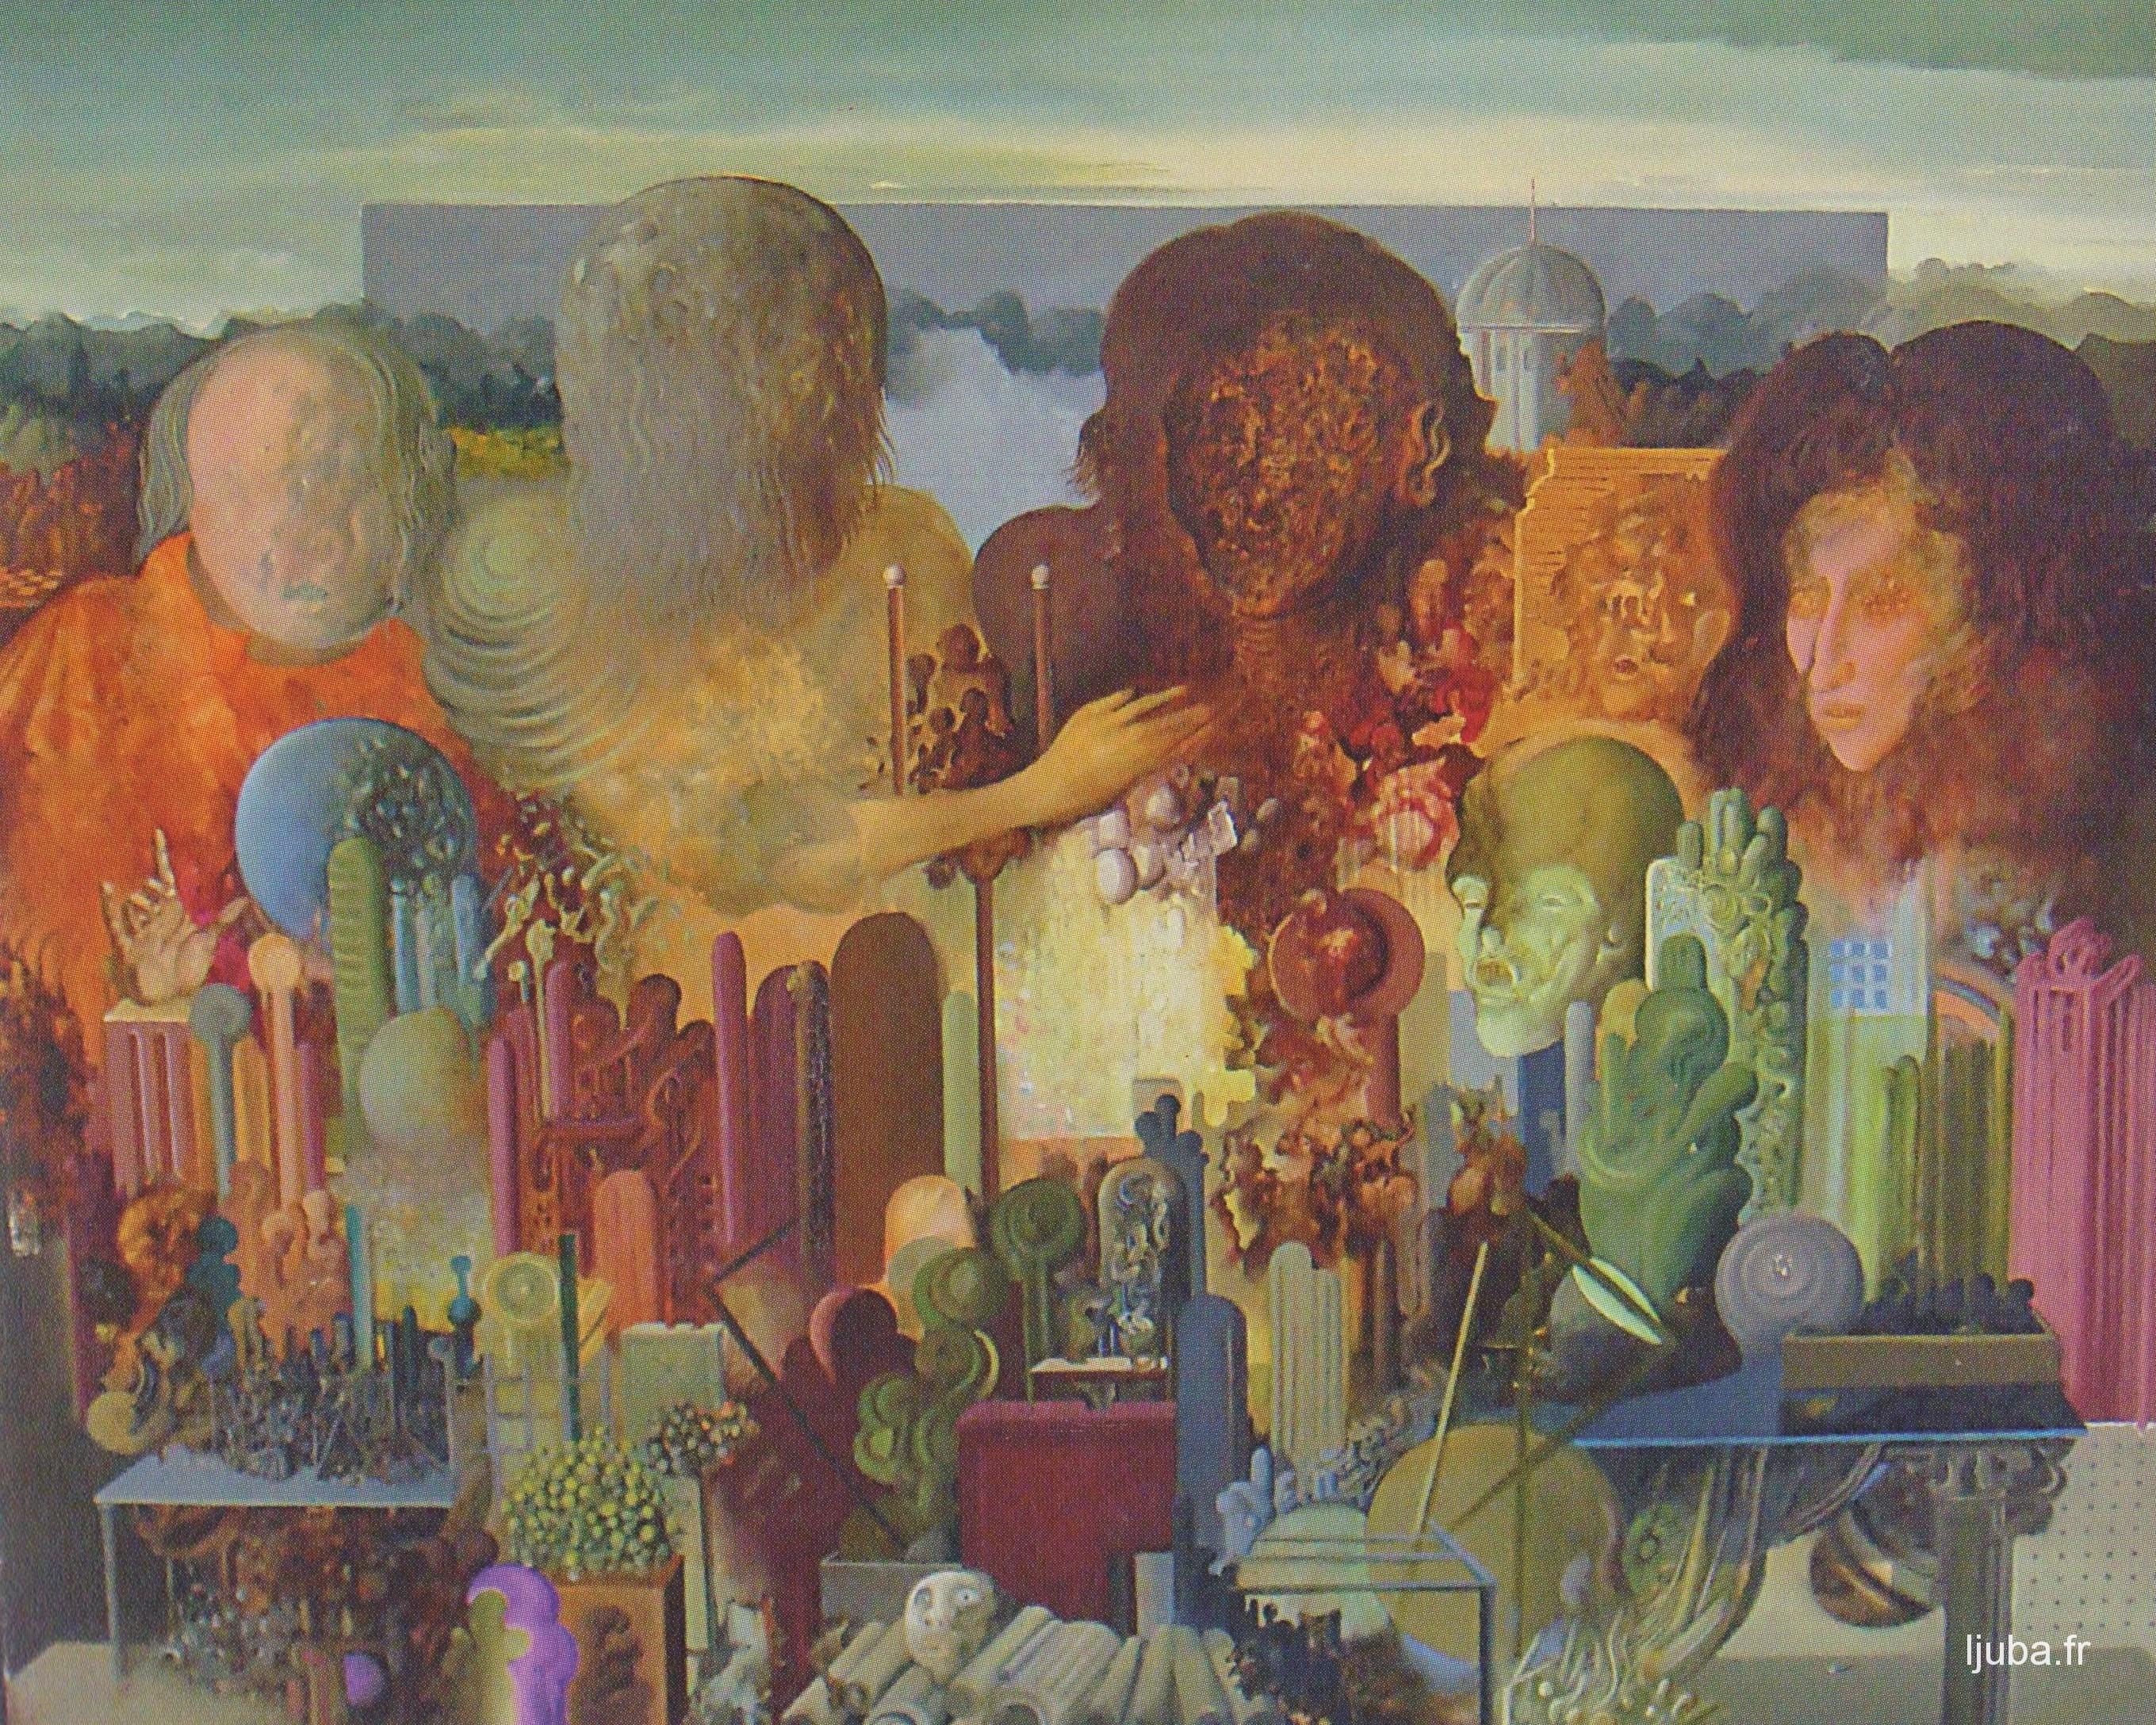 Ljuba Popovic - La ville des hommes mordus, 1969